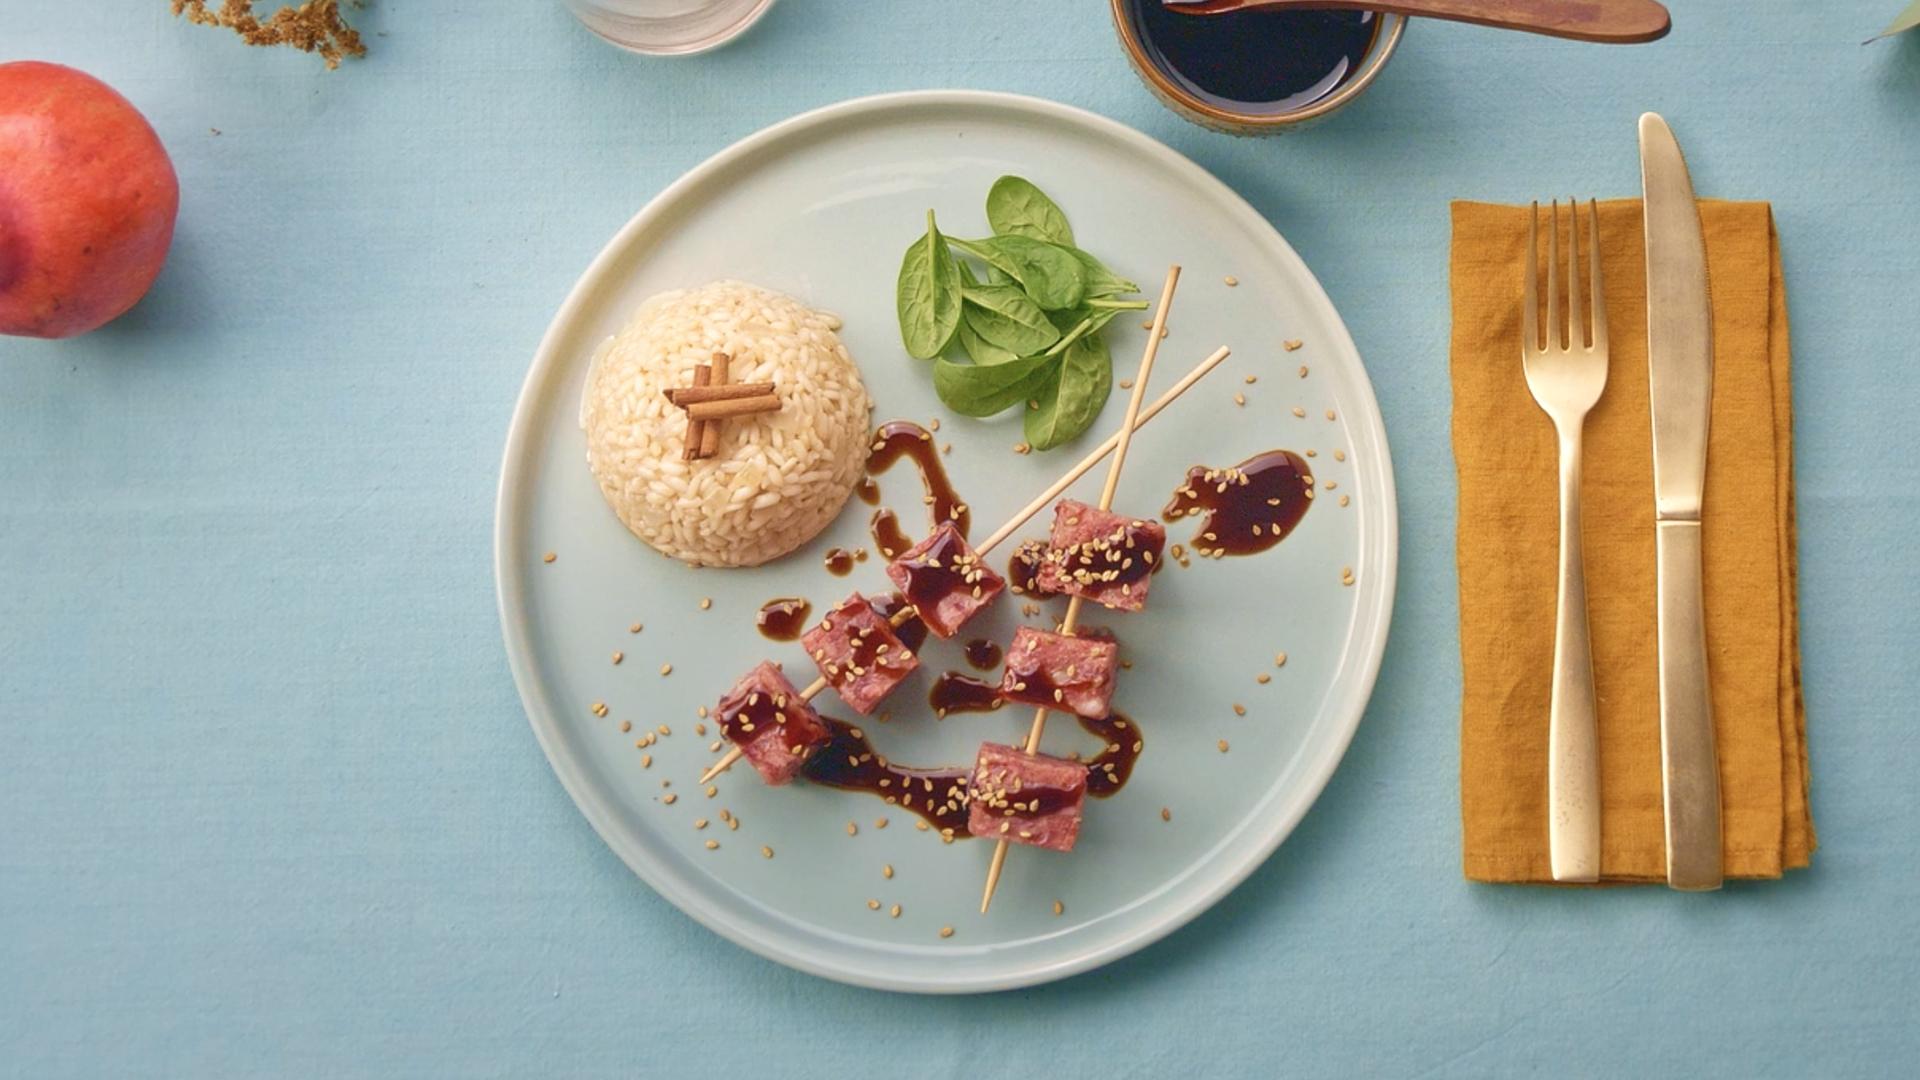 Cotechino con salsa teryiaki e riso pilaf